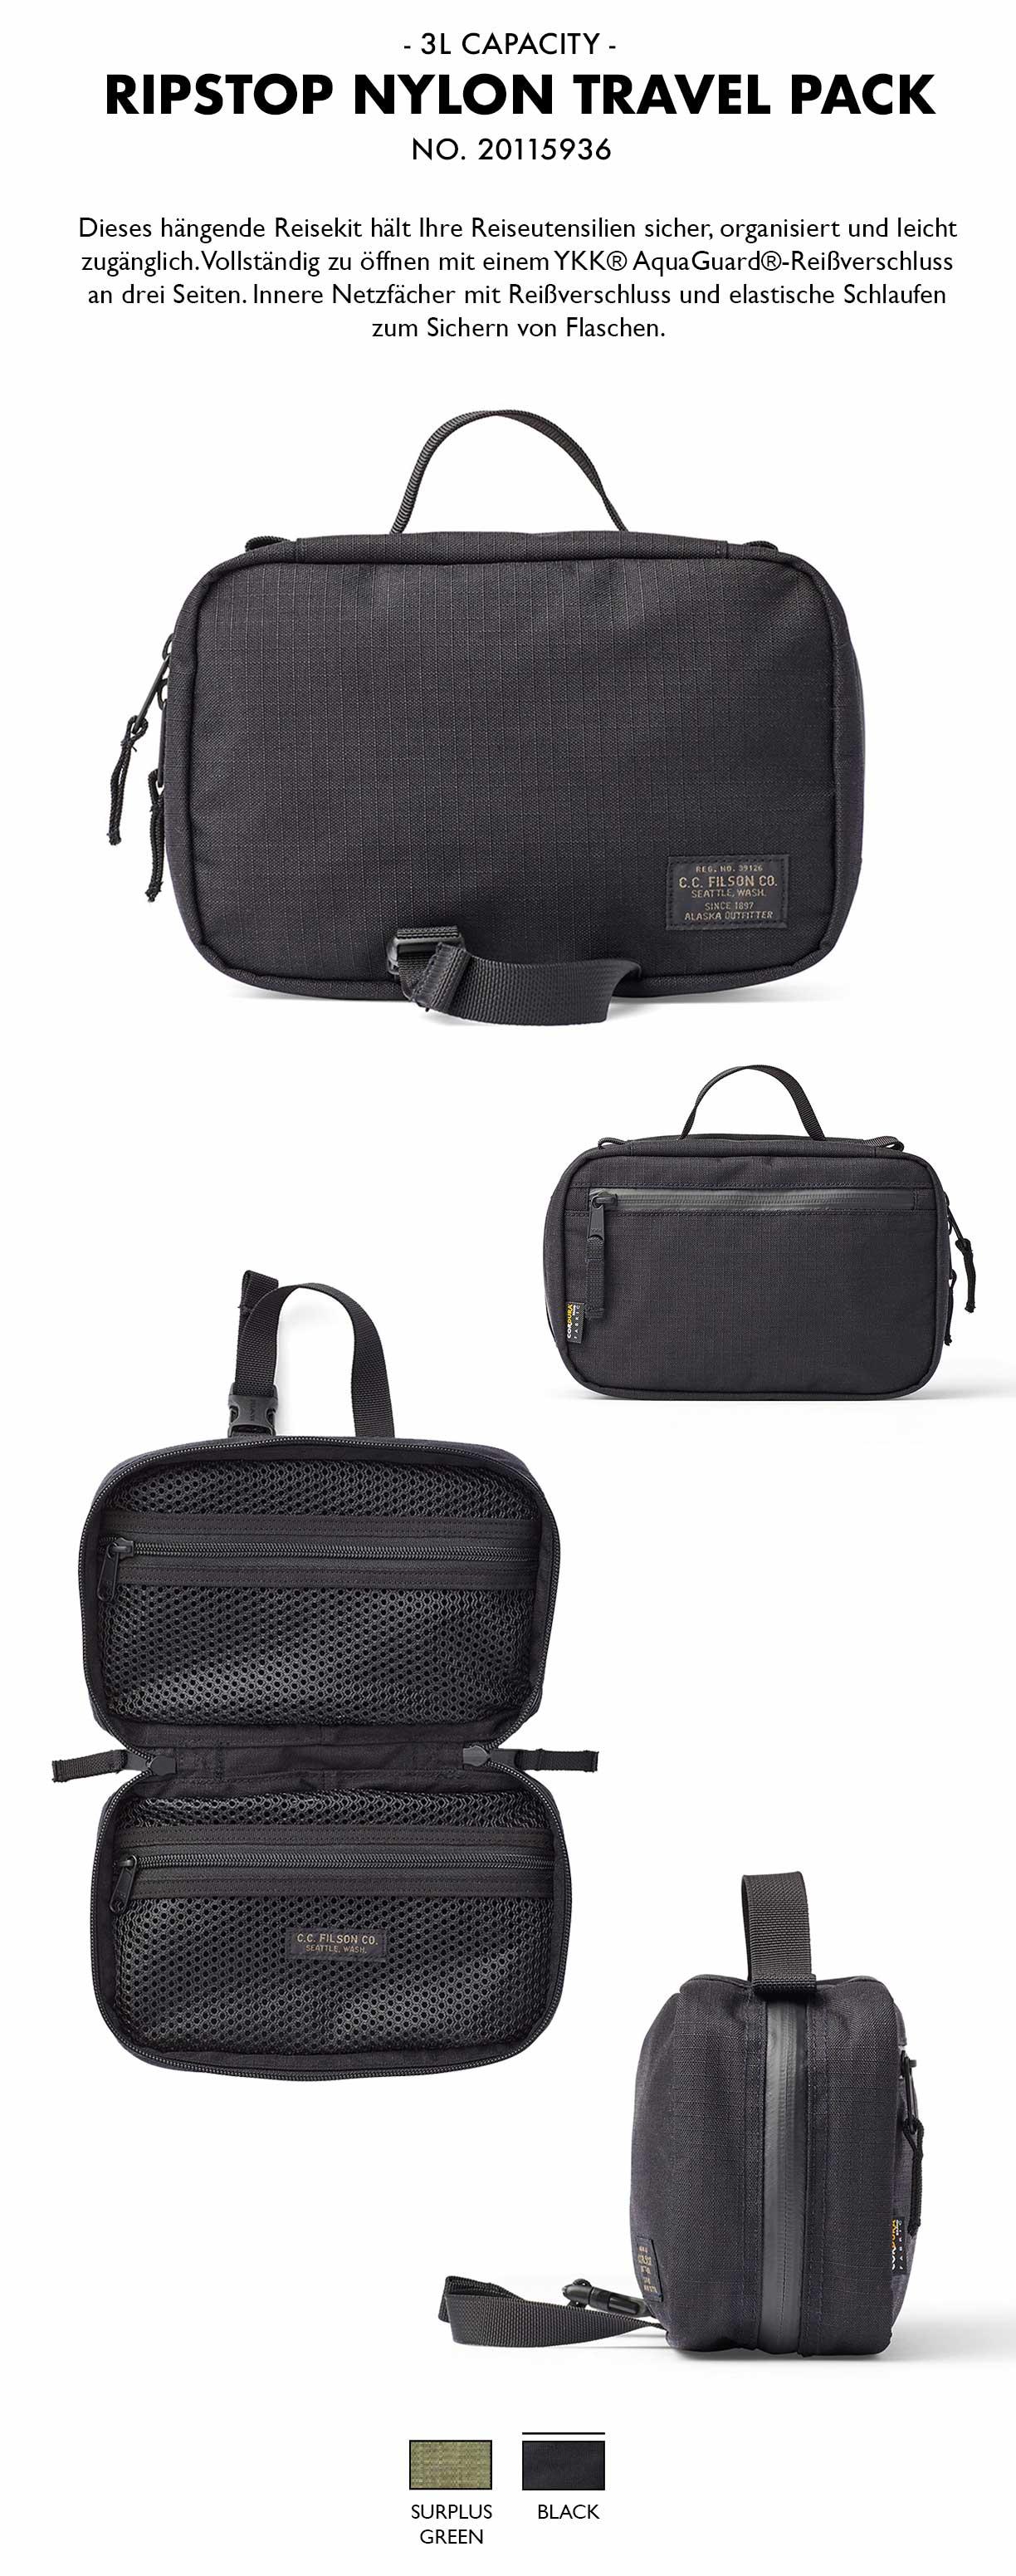 Filson Ripstop Nylon Travel Pack Black Produkt-informationen